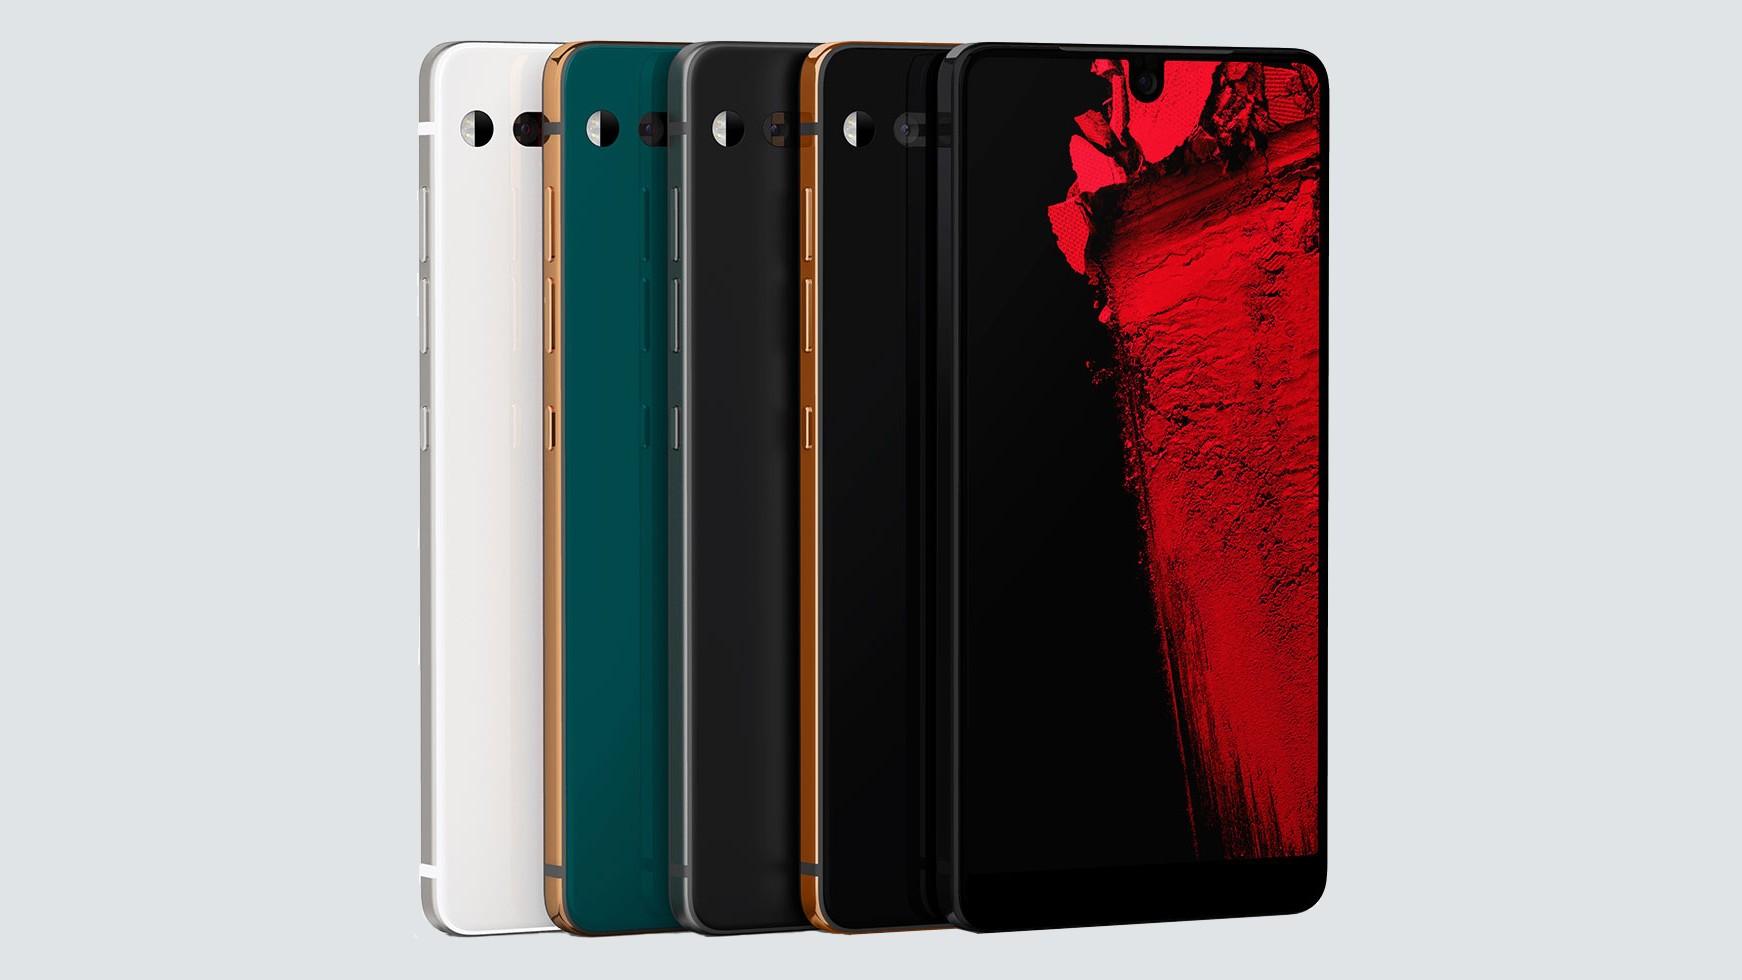 Essential Phone получил три эксклюзивных цвета